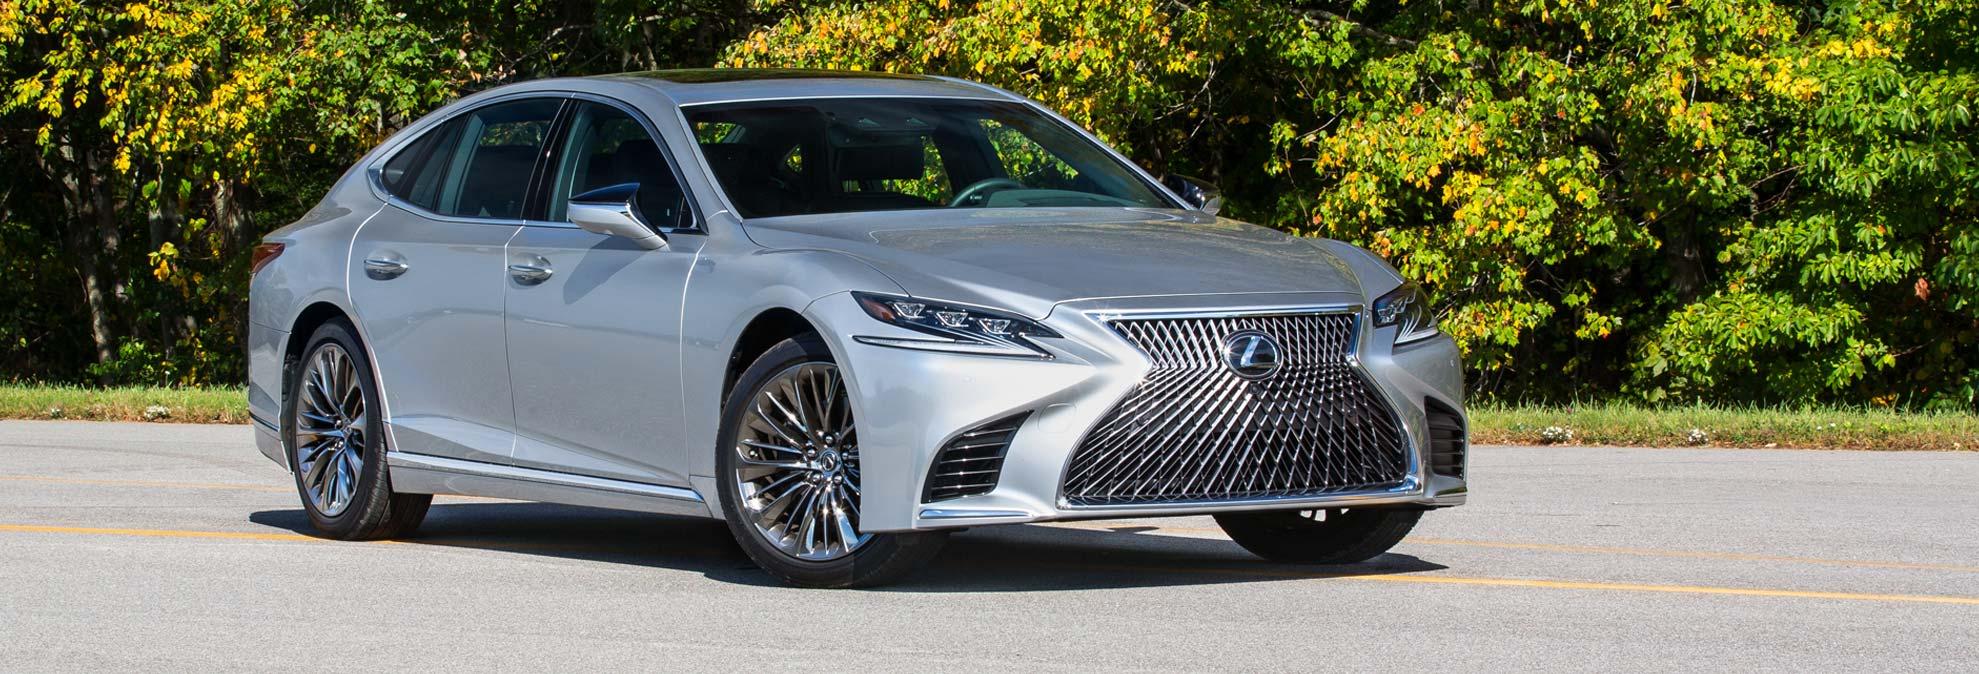 lexus and luxury car